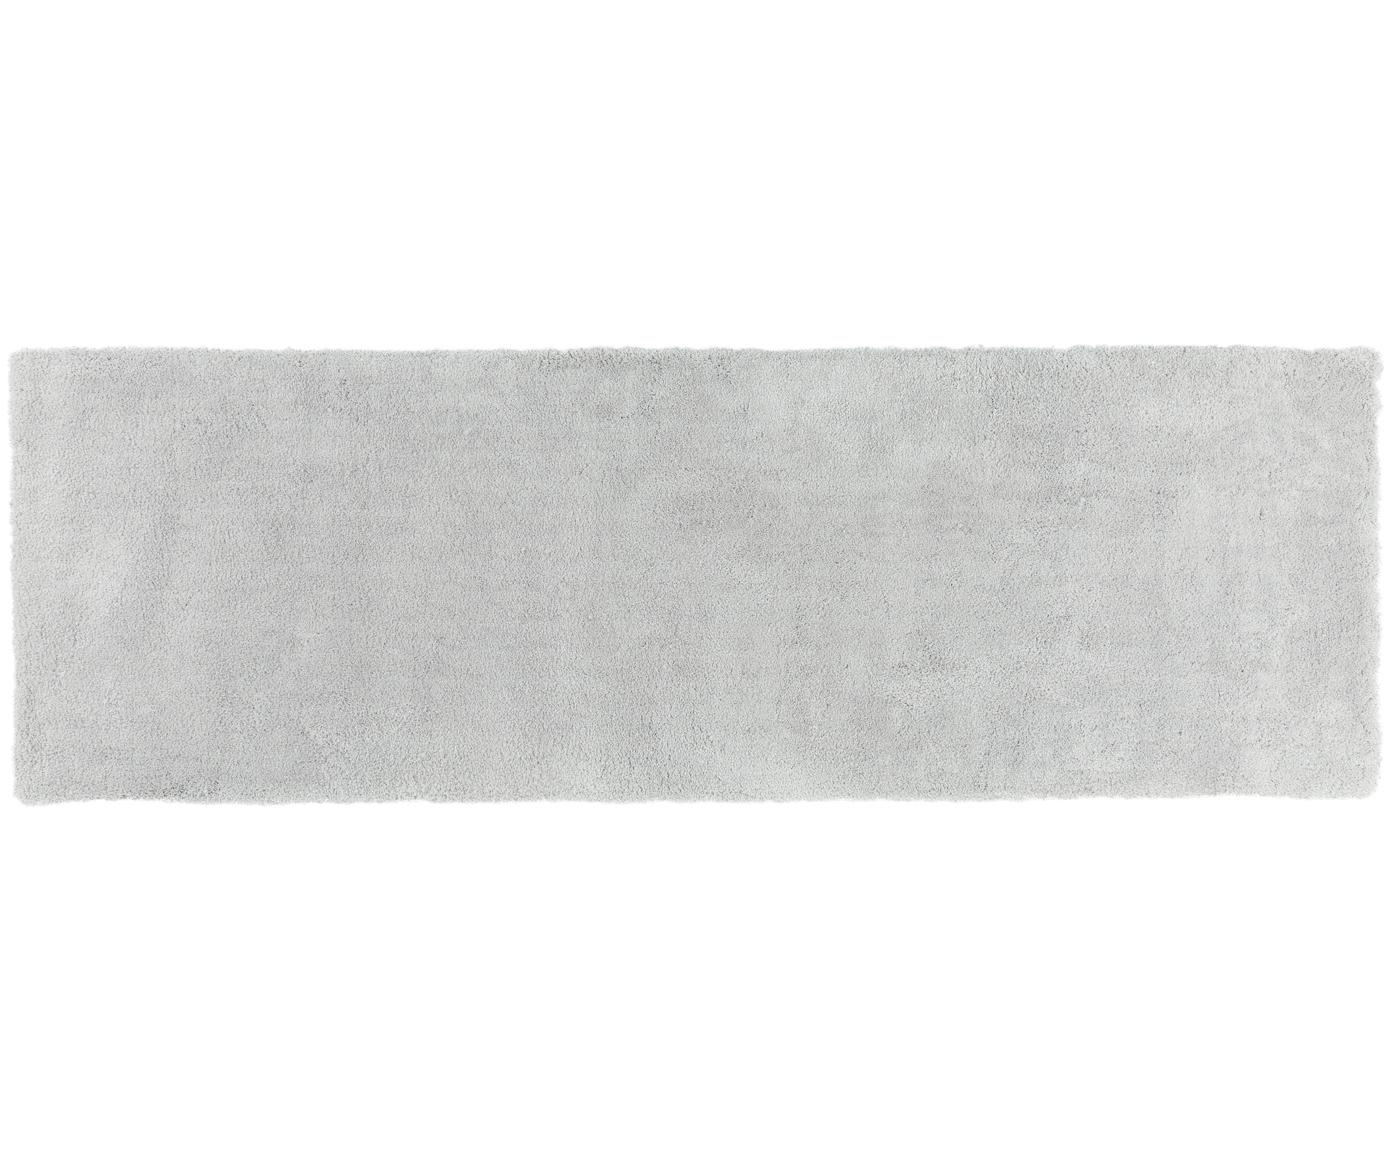 Passatoia pelosa morbida grigio chiaro Leighton, Retro: 100% poliestere, Grigio chiaro, Larg. 80 x Lung. 250 cm